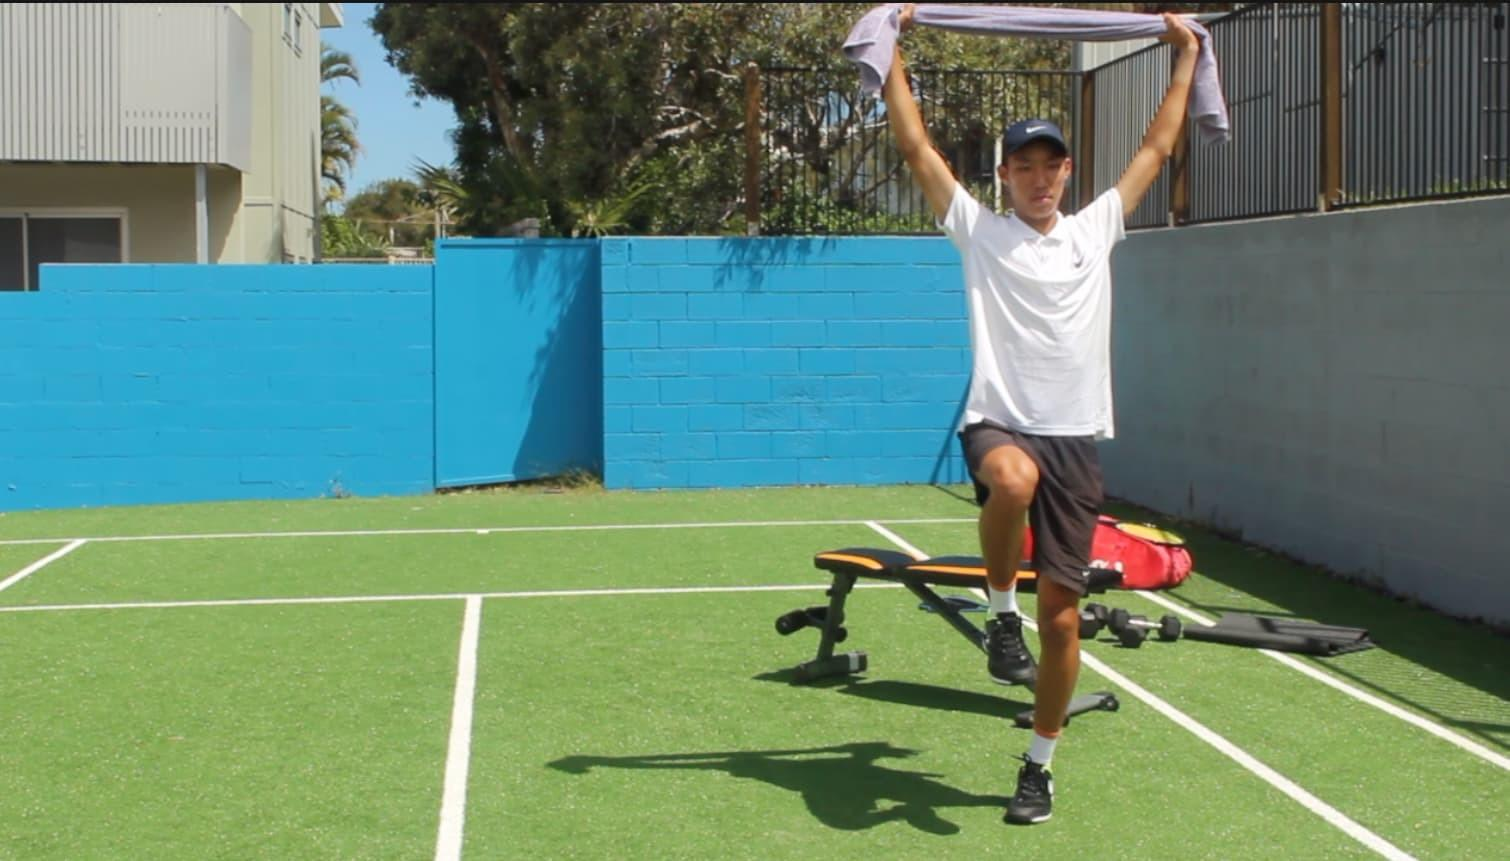 image tennis movement